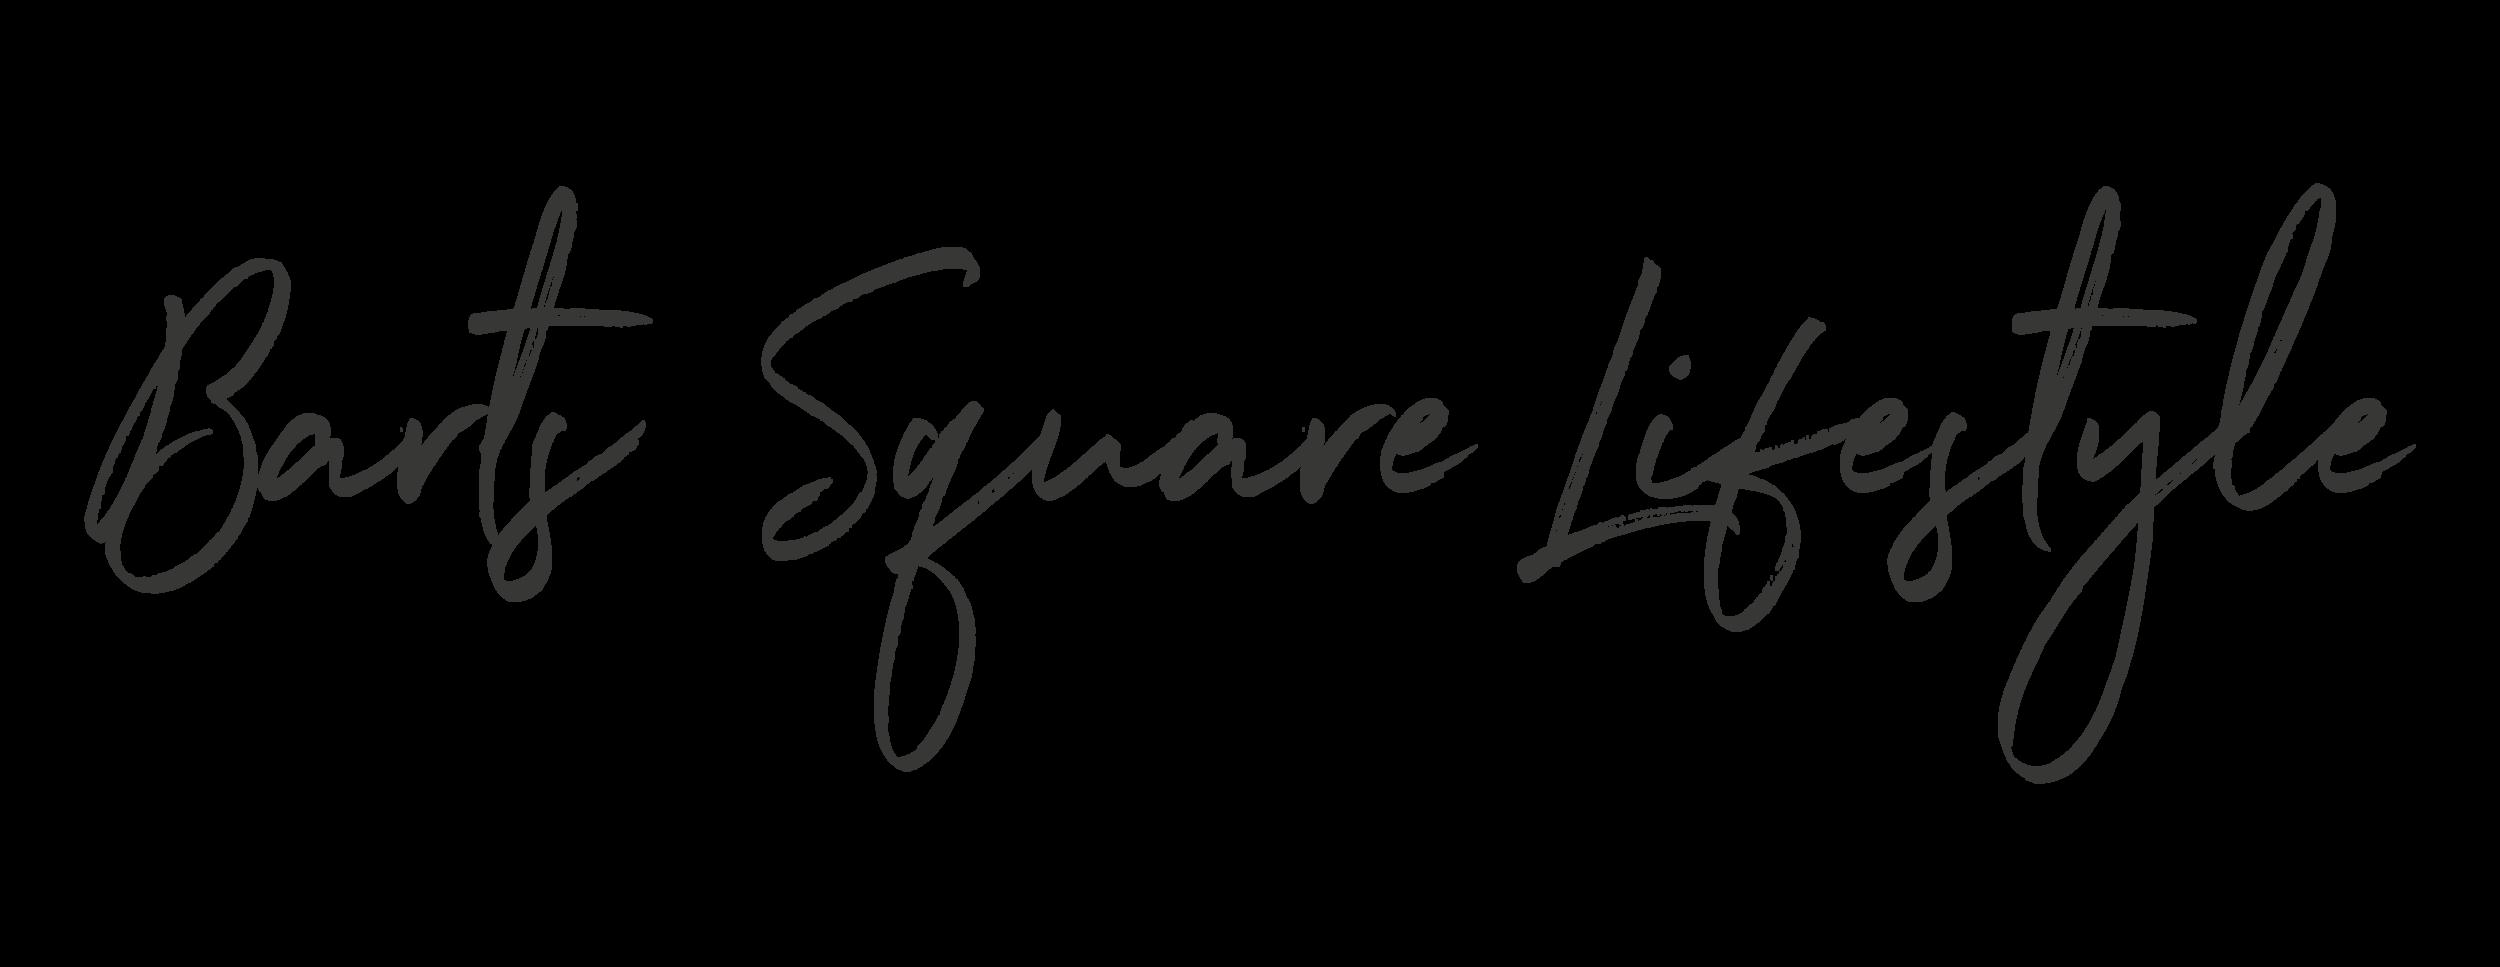 Barts Sqr lifestyle-28.png